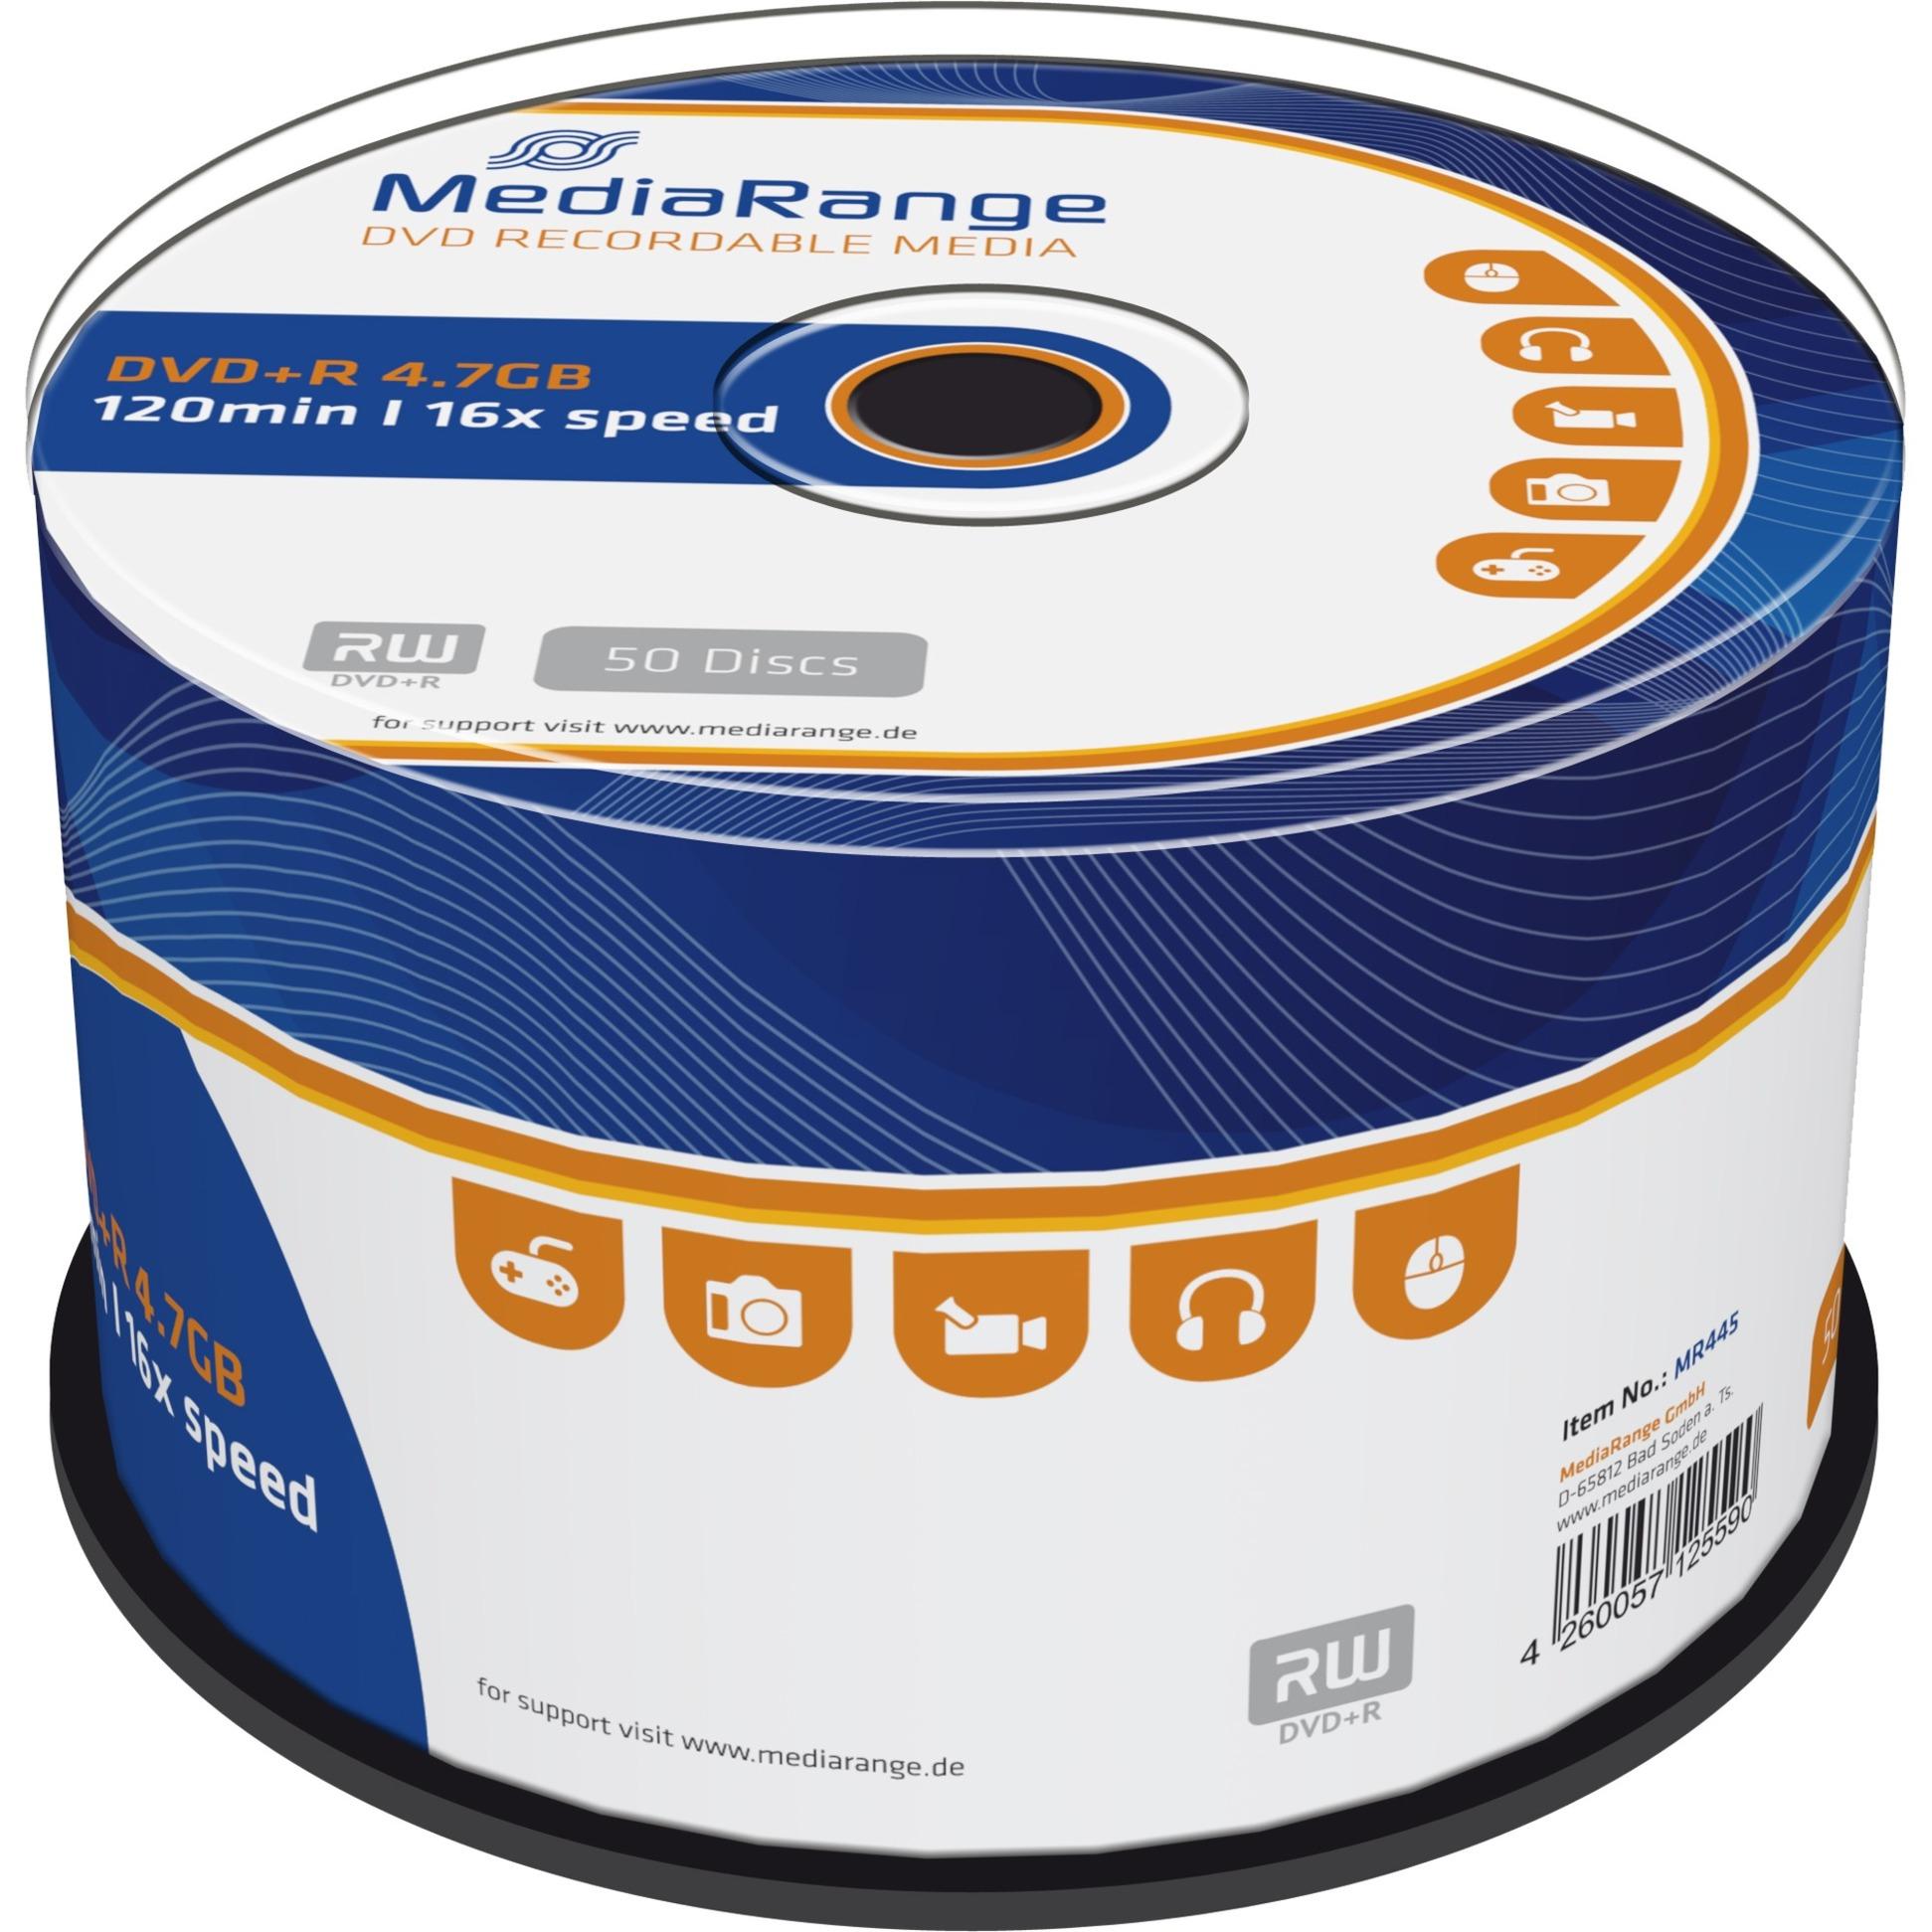 rubber-lens-hood-f-standard-lenses-49-mm-graa-modlysblander-dvd-tomme-medier